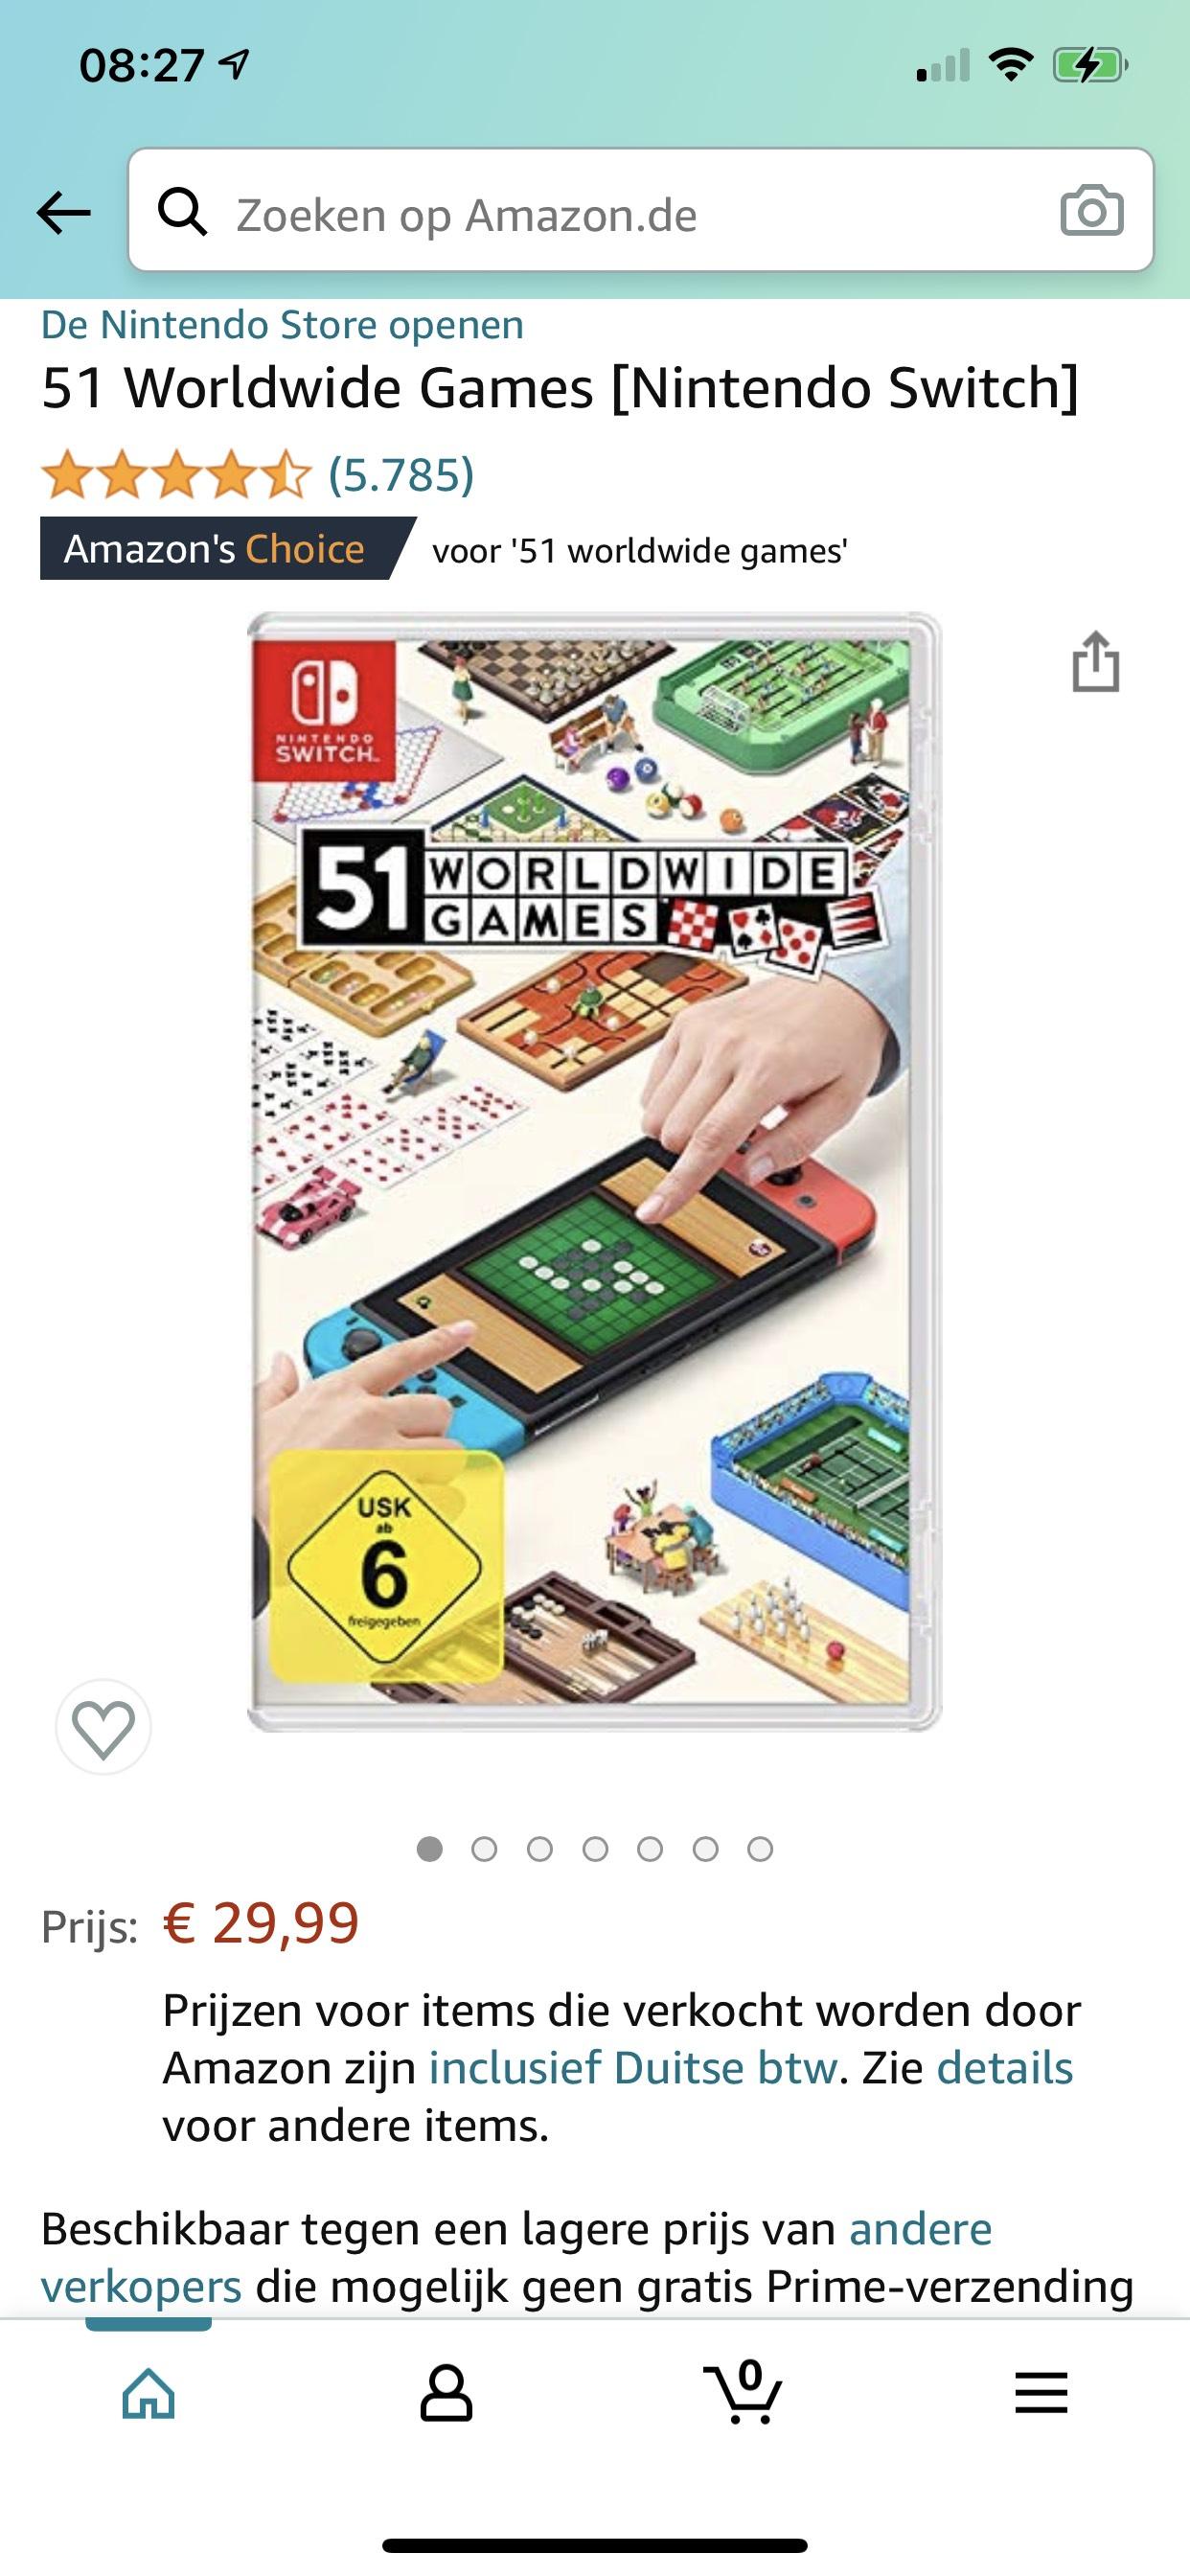 Nintendo Switch: 51 Worldwide Games